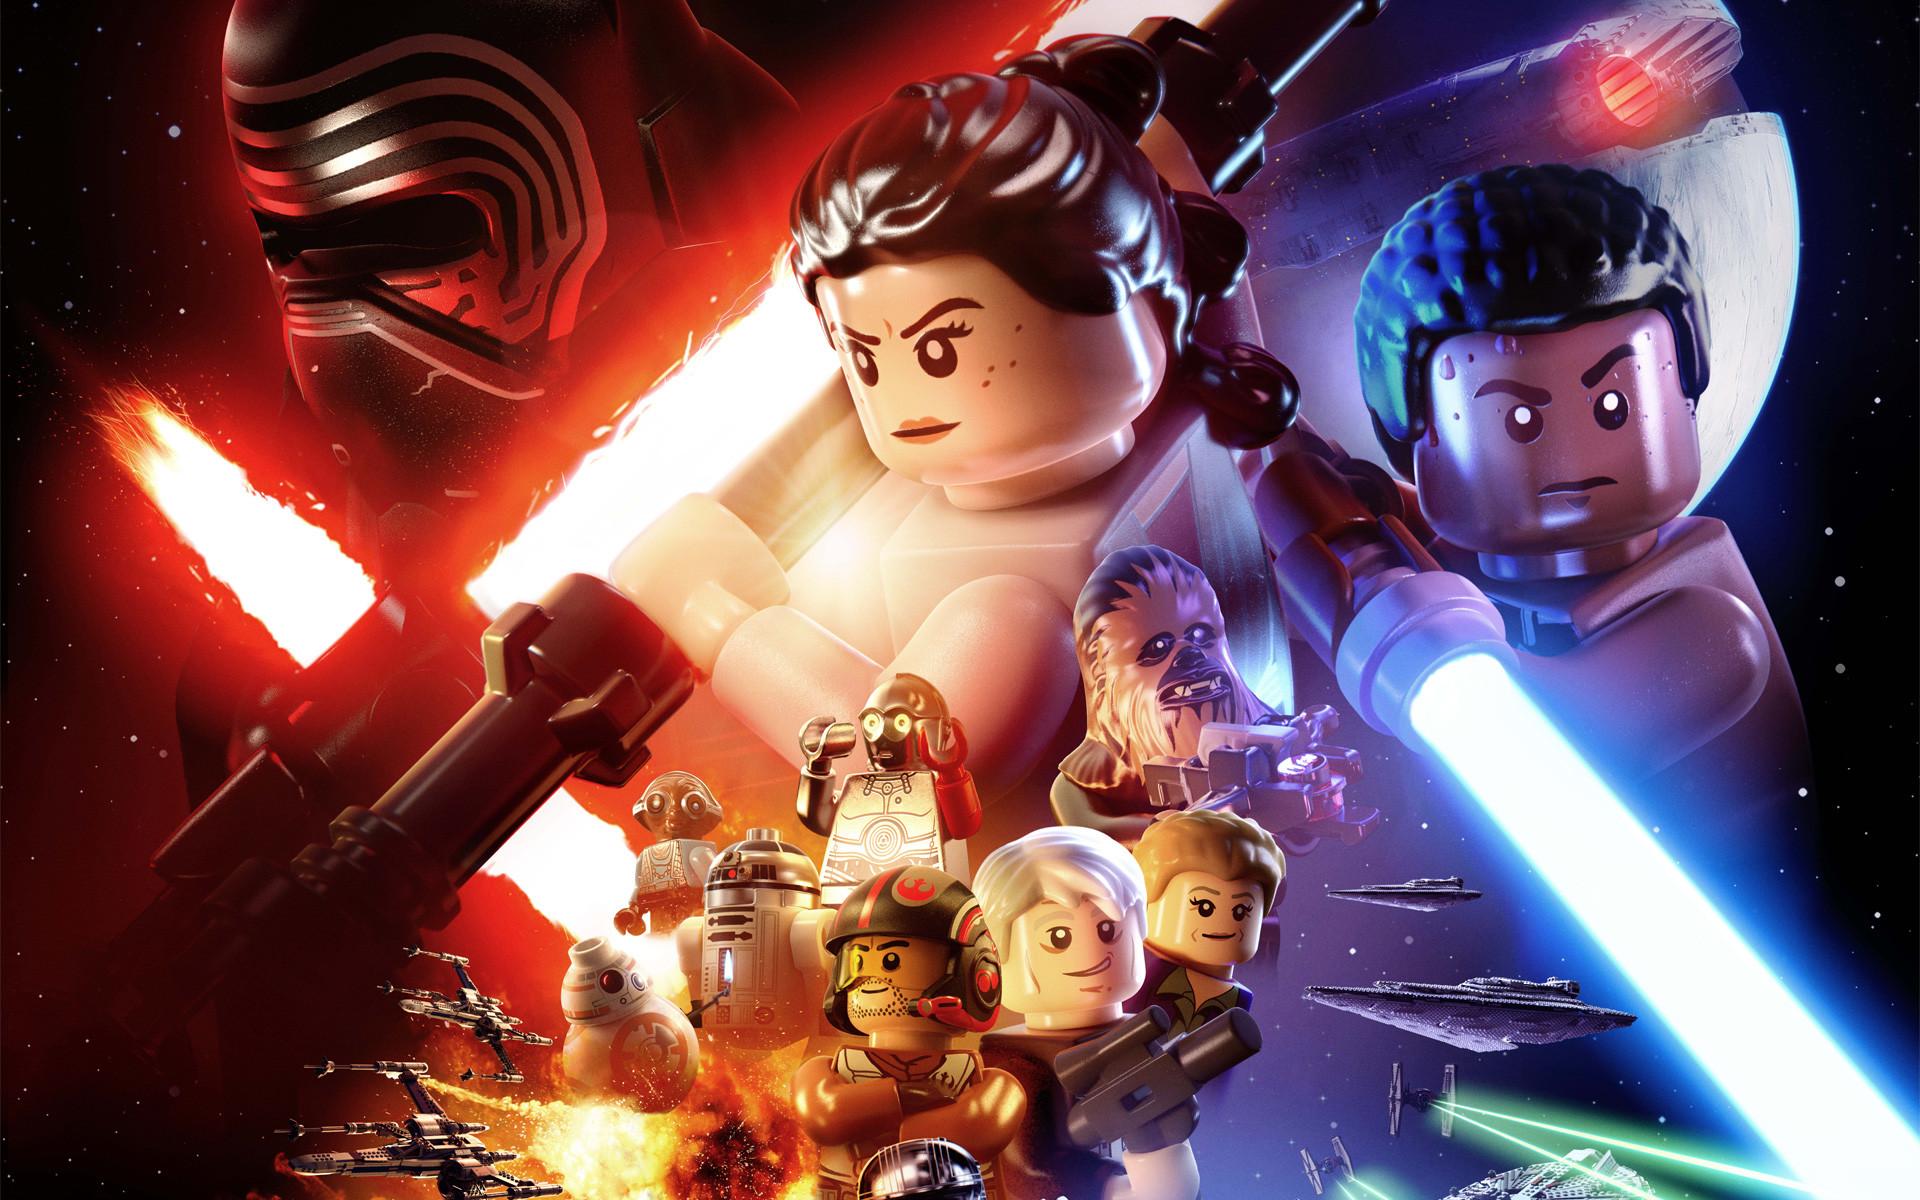 44 Rey (Star Wars) HD Wallpapers